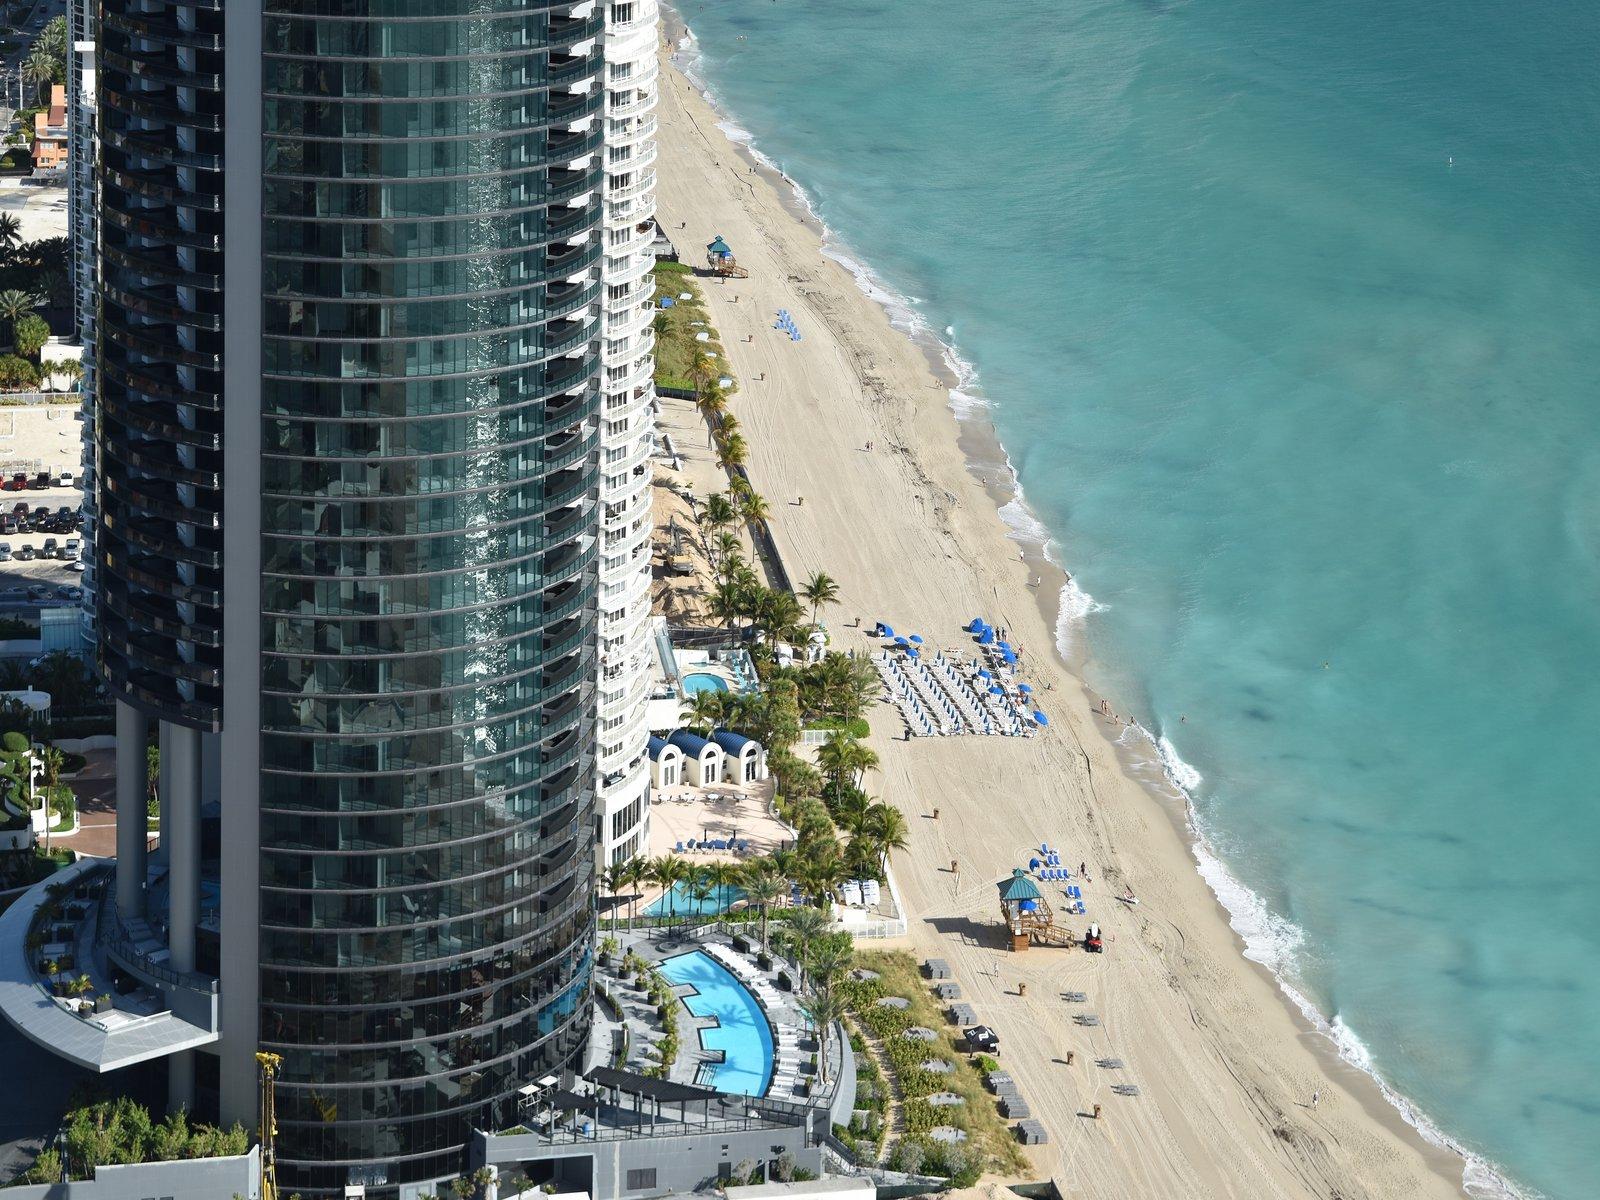 Photo 2 Of 11 In Porsche Designs Lavish Residential Tower In Miami